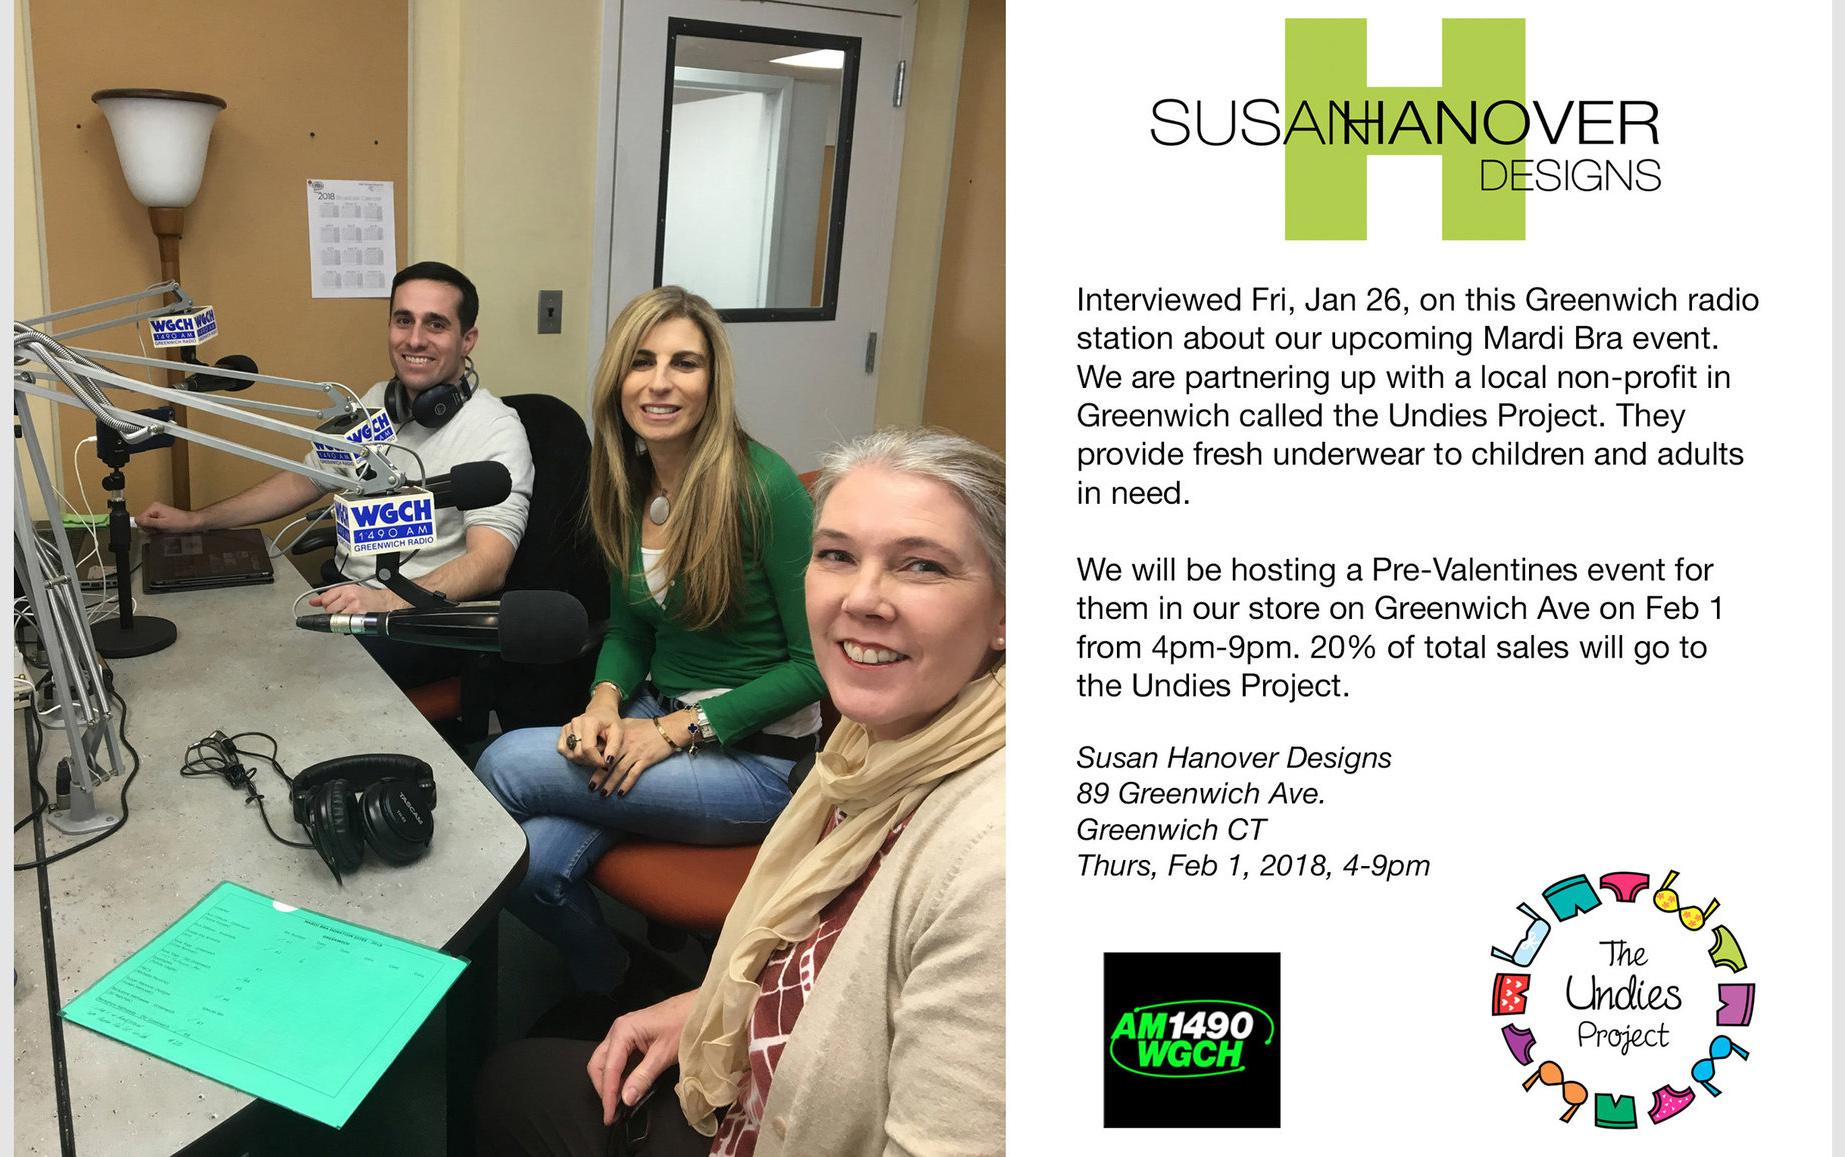 Greenwich Radio Show: Charity event for Mardi Bra/the Undies Project, Feb '18